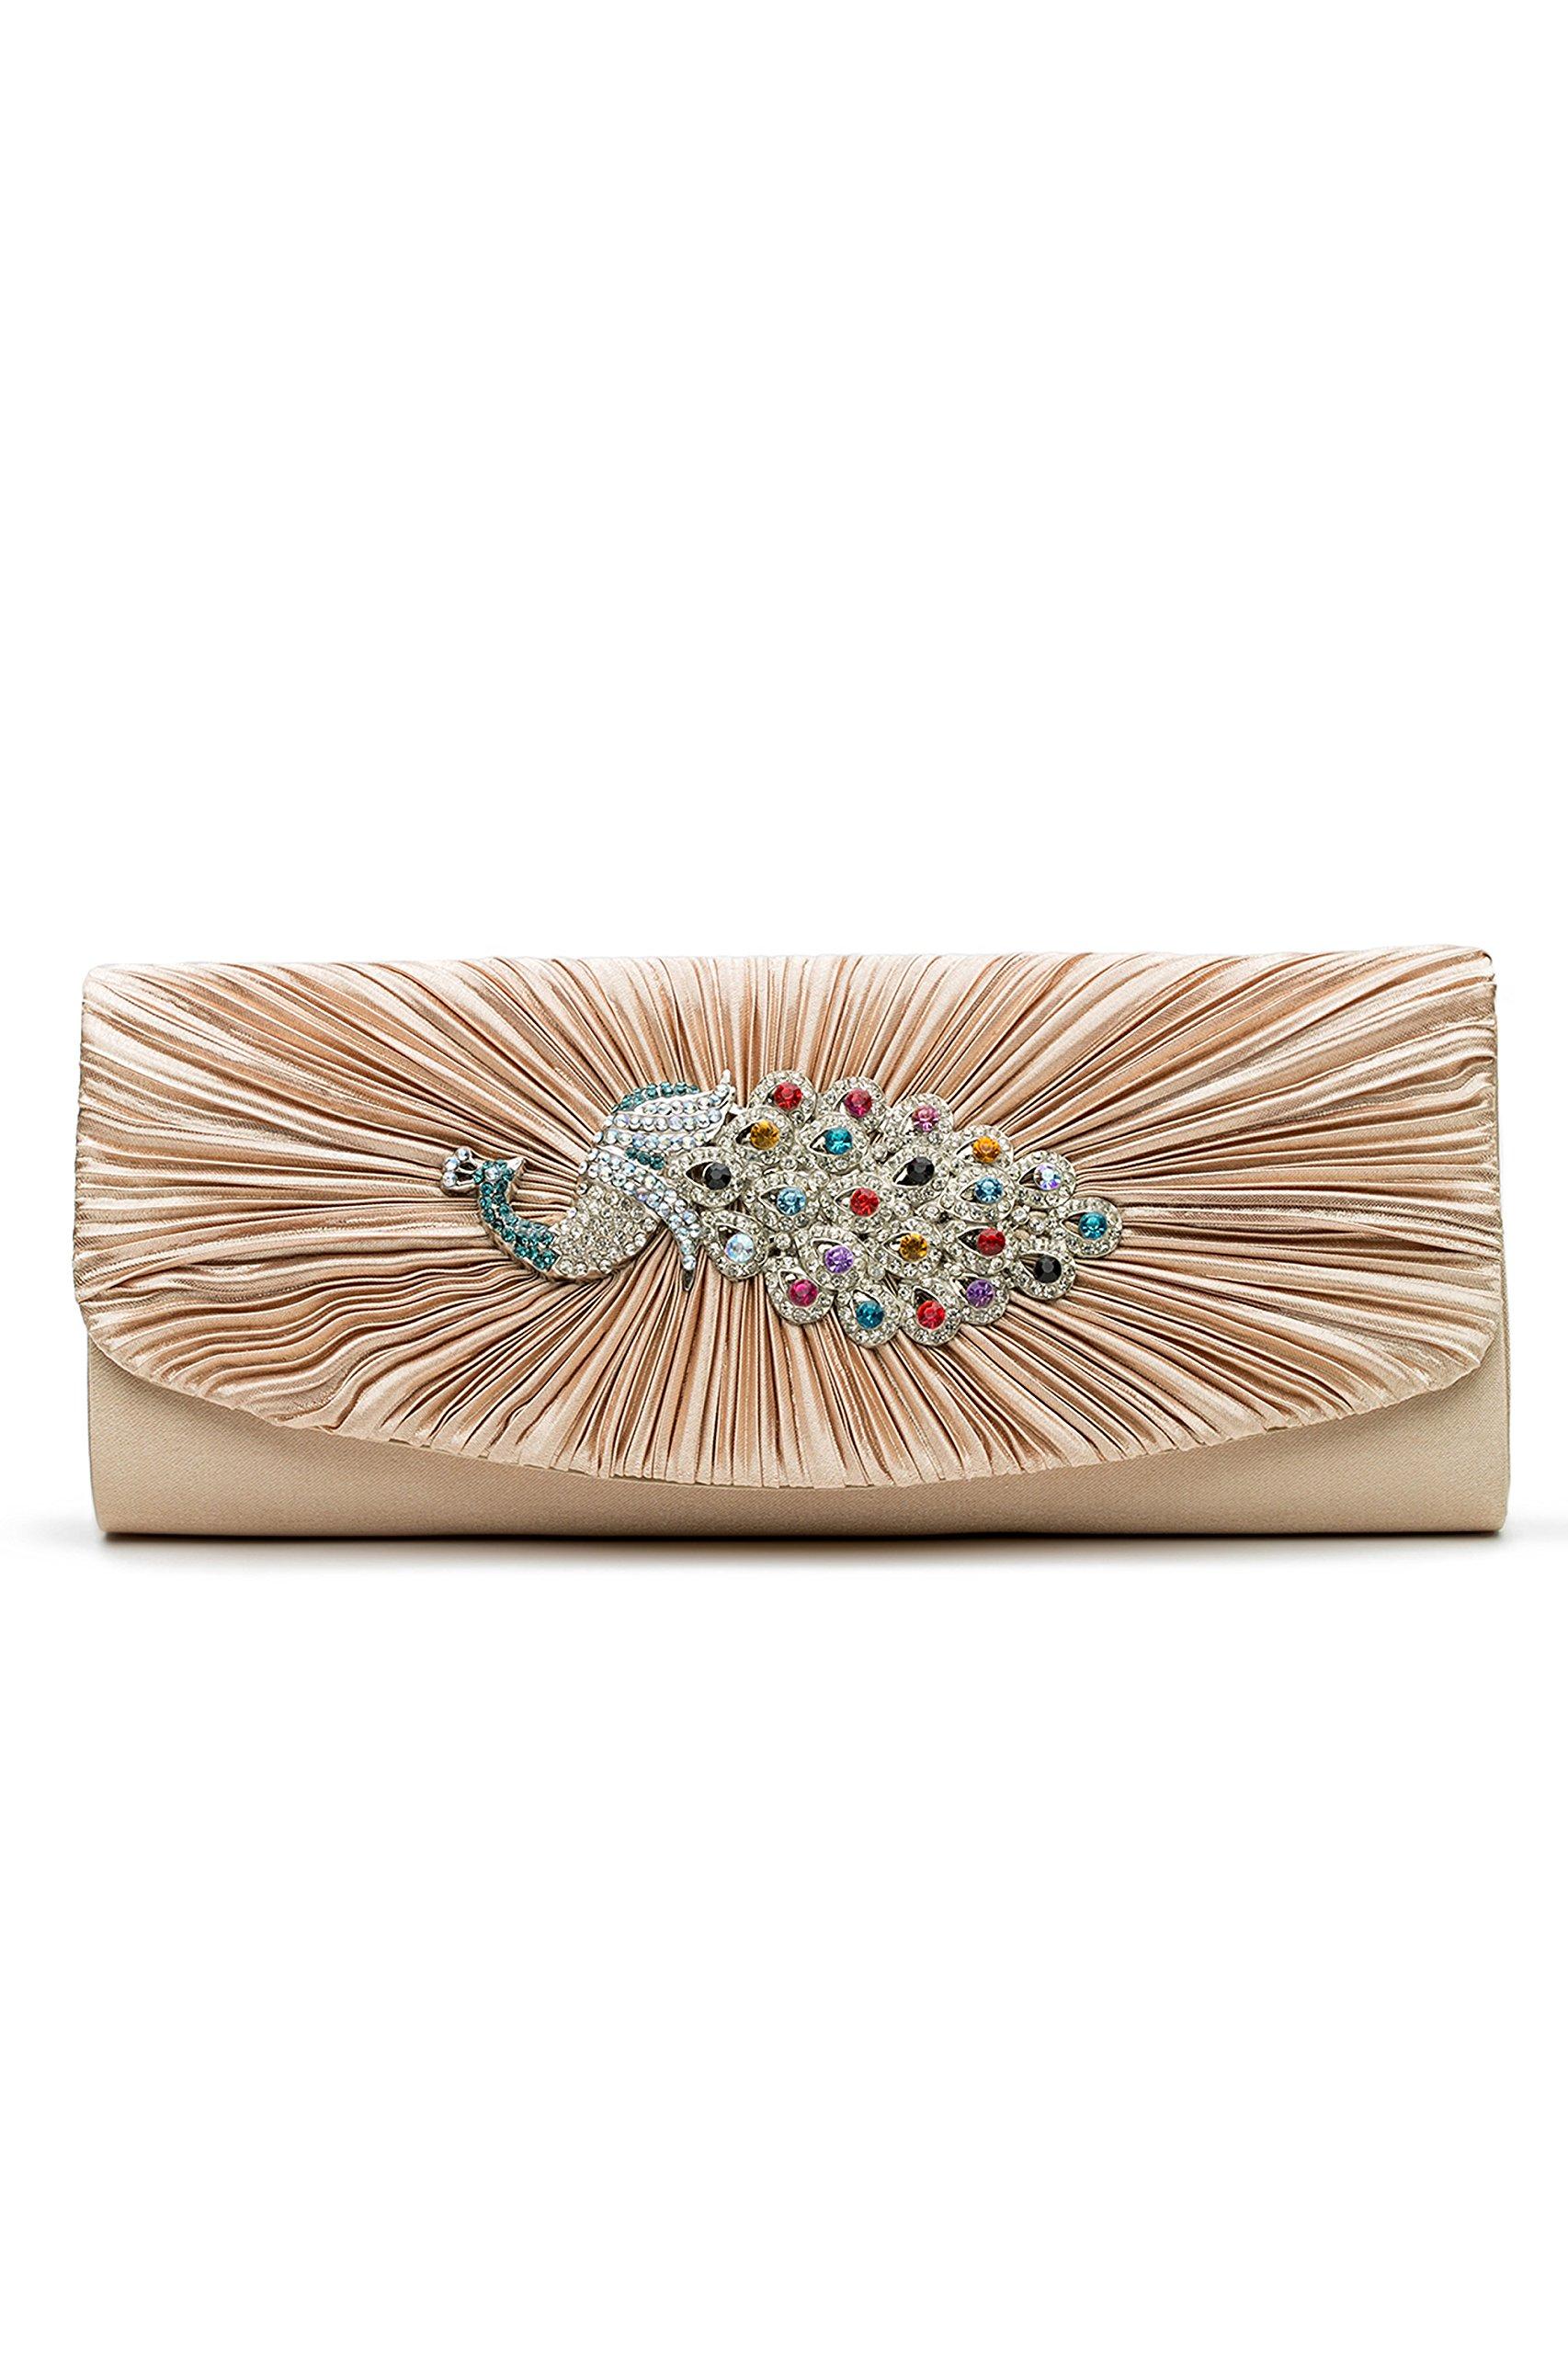 Women Envelope Clutch Bag Peacock Crystal Purse Glitter Handbag With Chain Strap (gold)